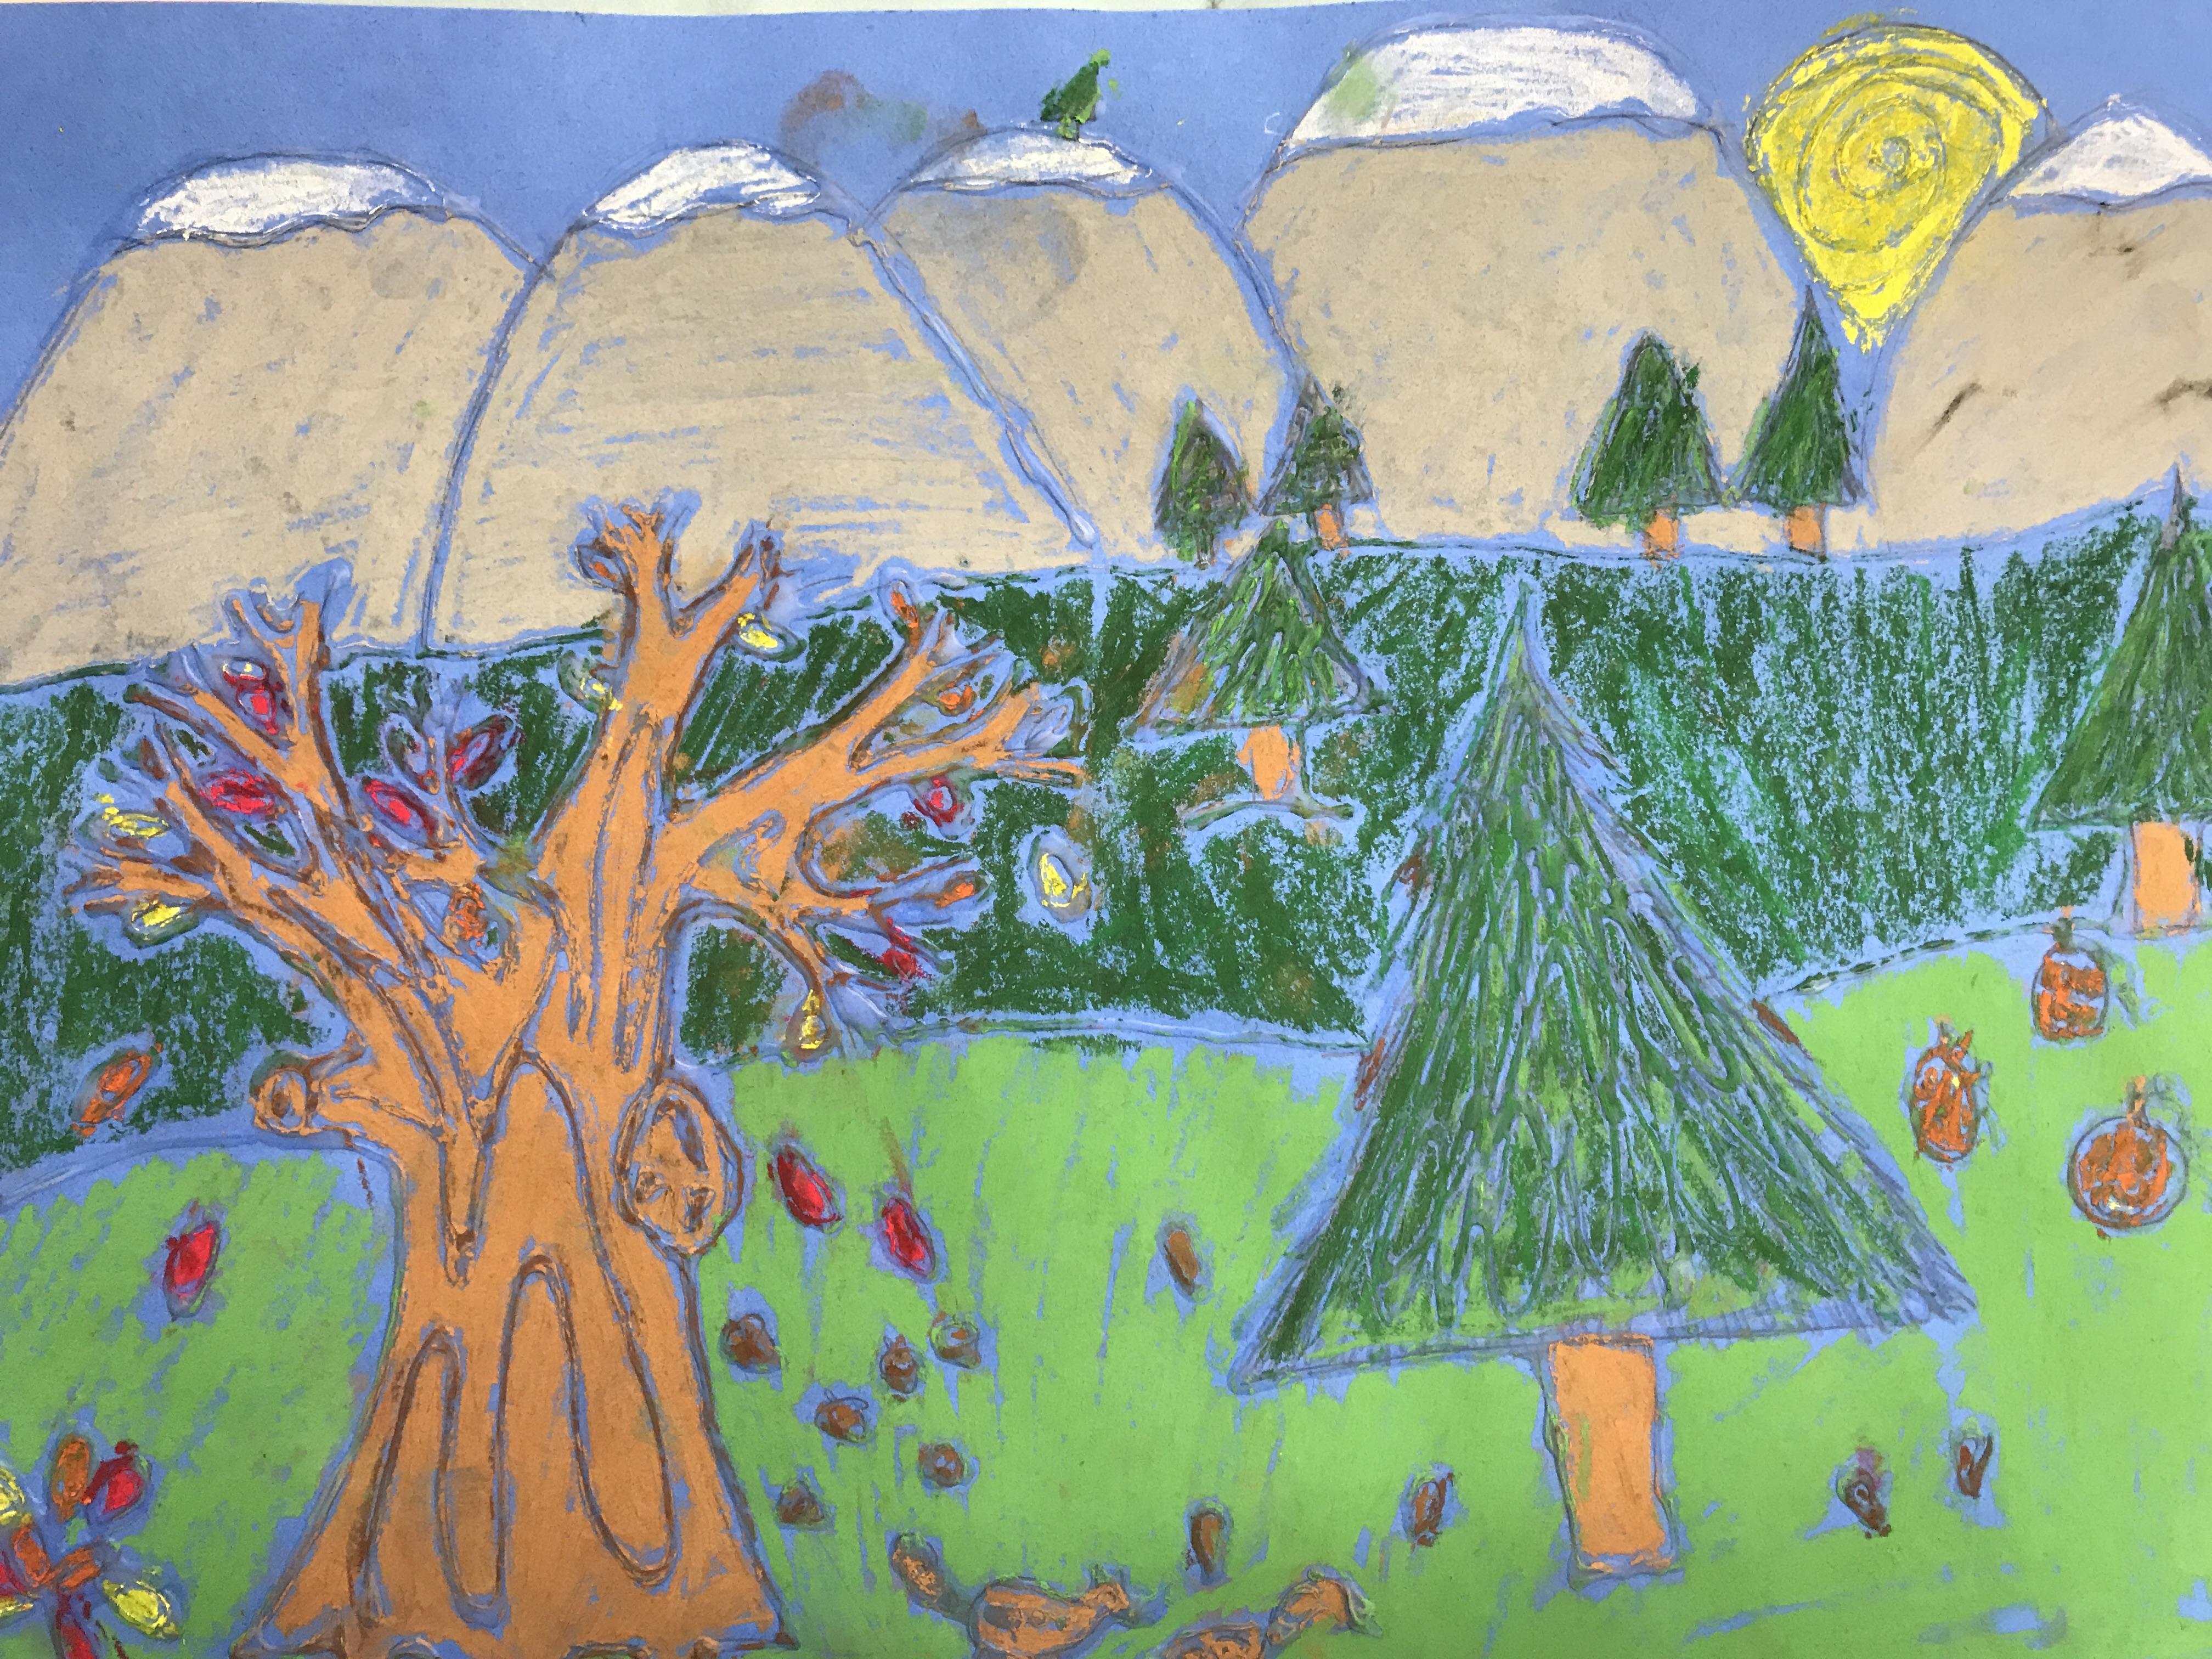 Mrs. Reynaert's Art Studio | Dearborn Public Schools